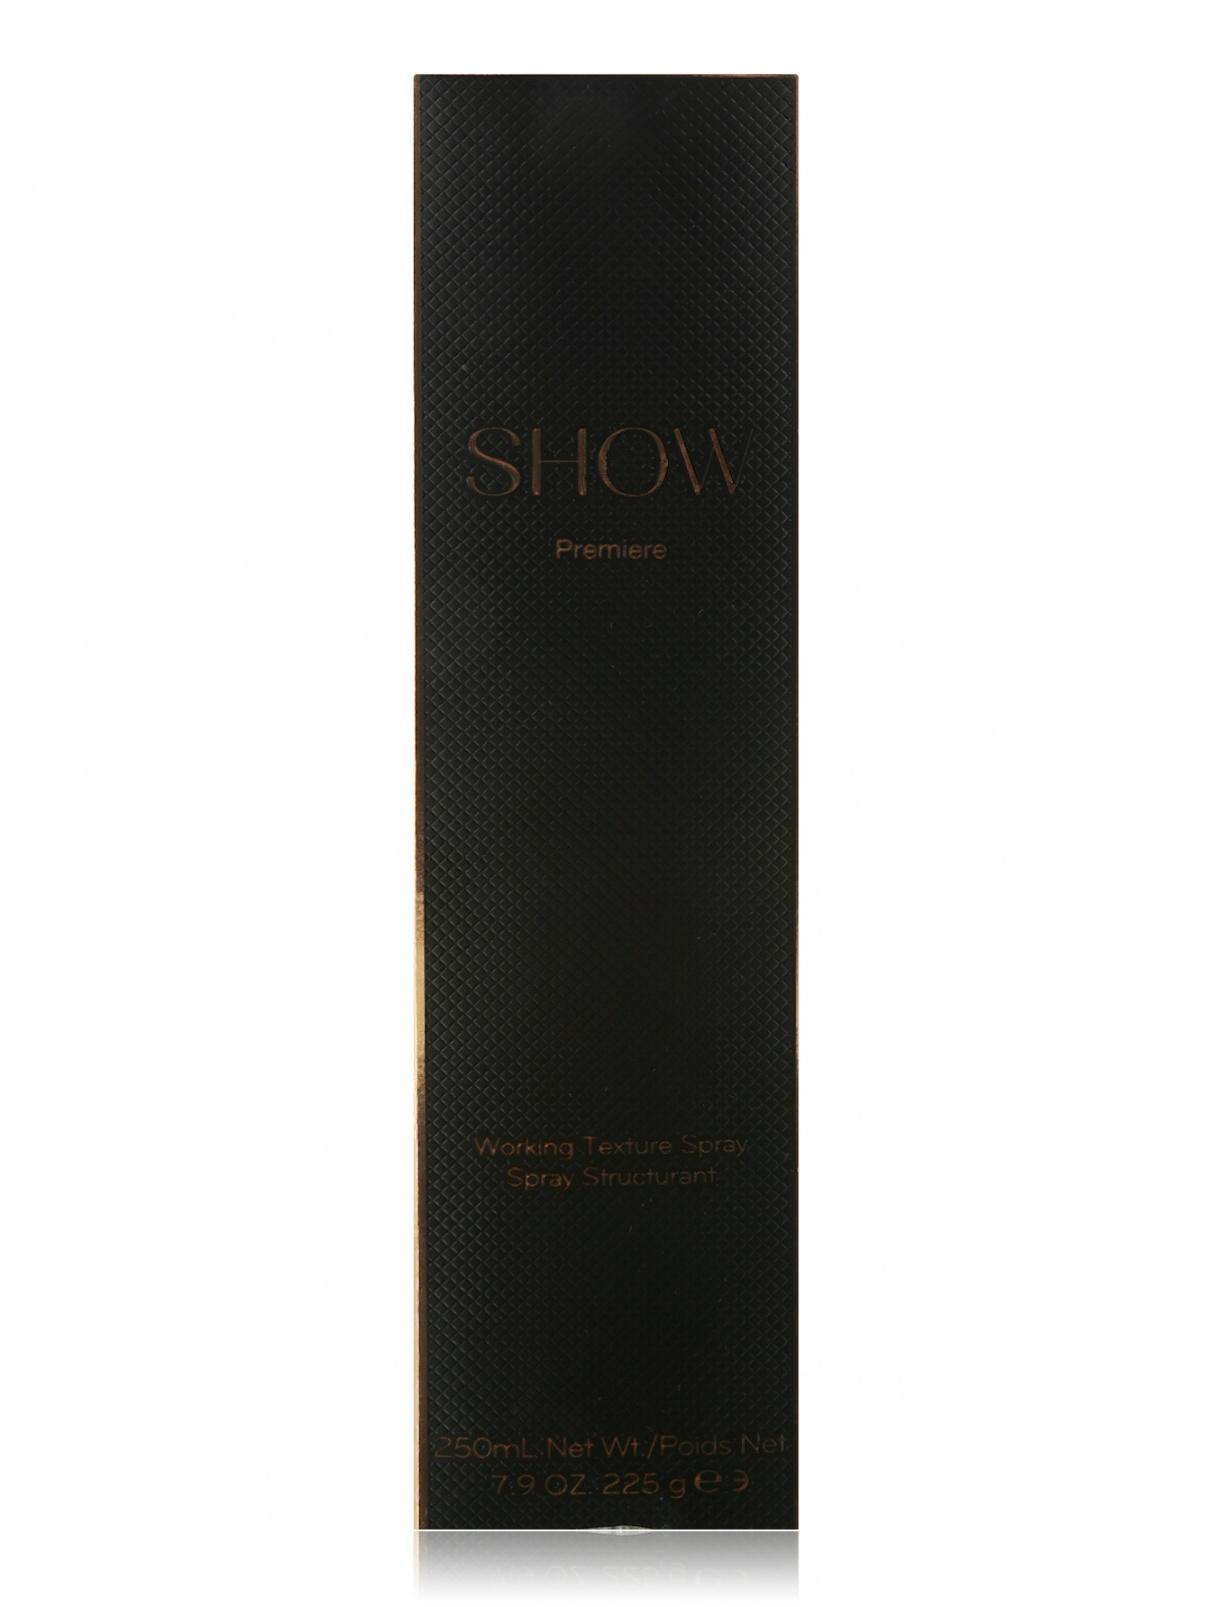 Текстурирующий спрей Premiere 250 мл Hair Care Show Beauty  –  Общий вид